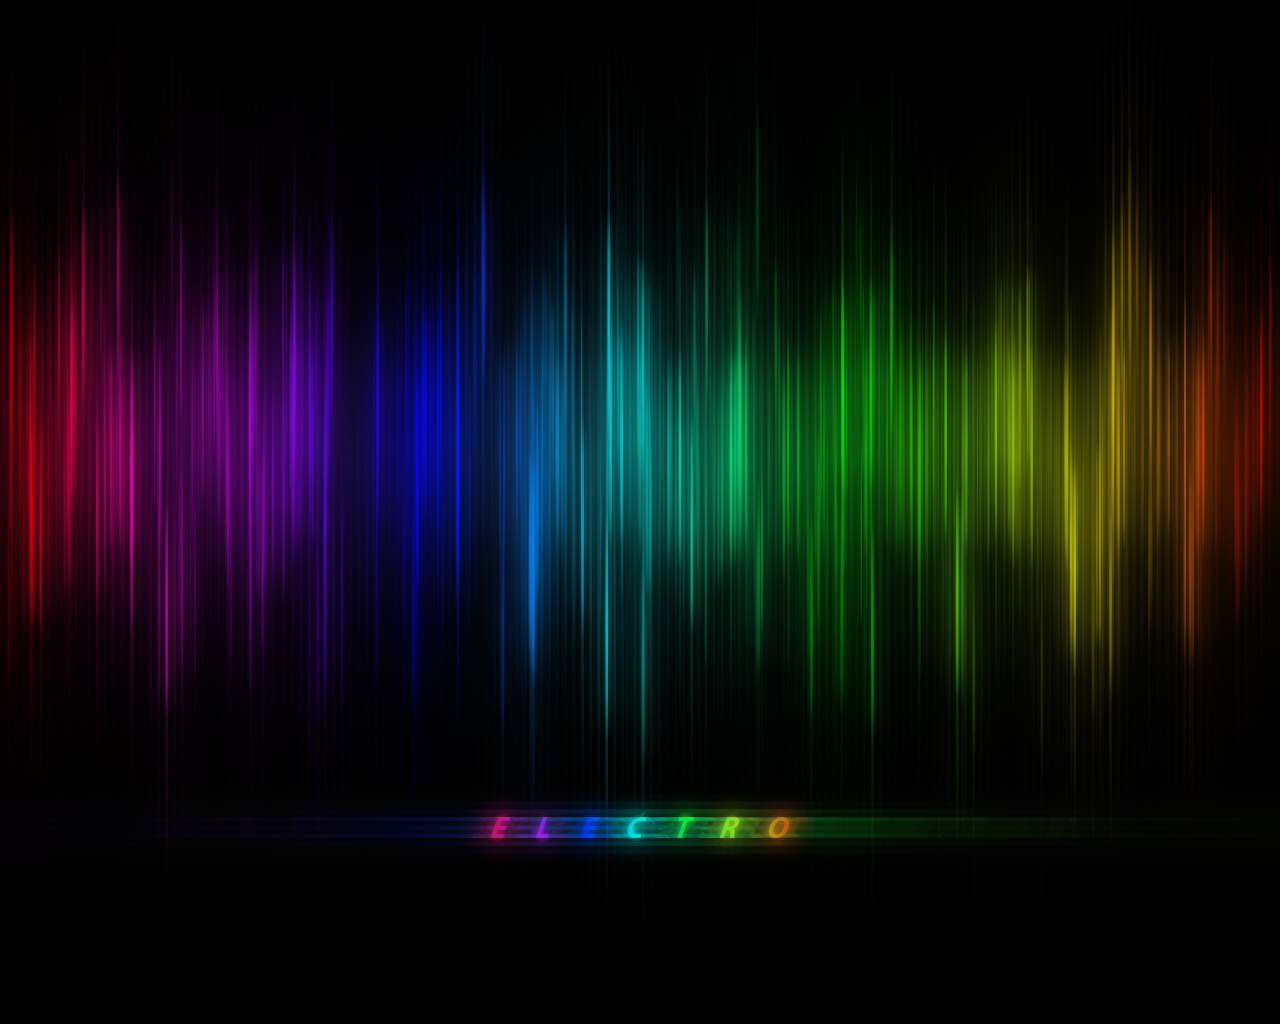 DJ Background Wallpaper